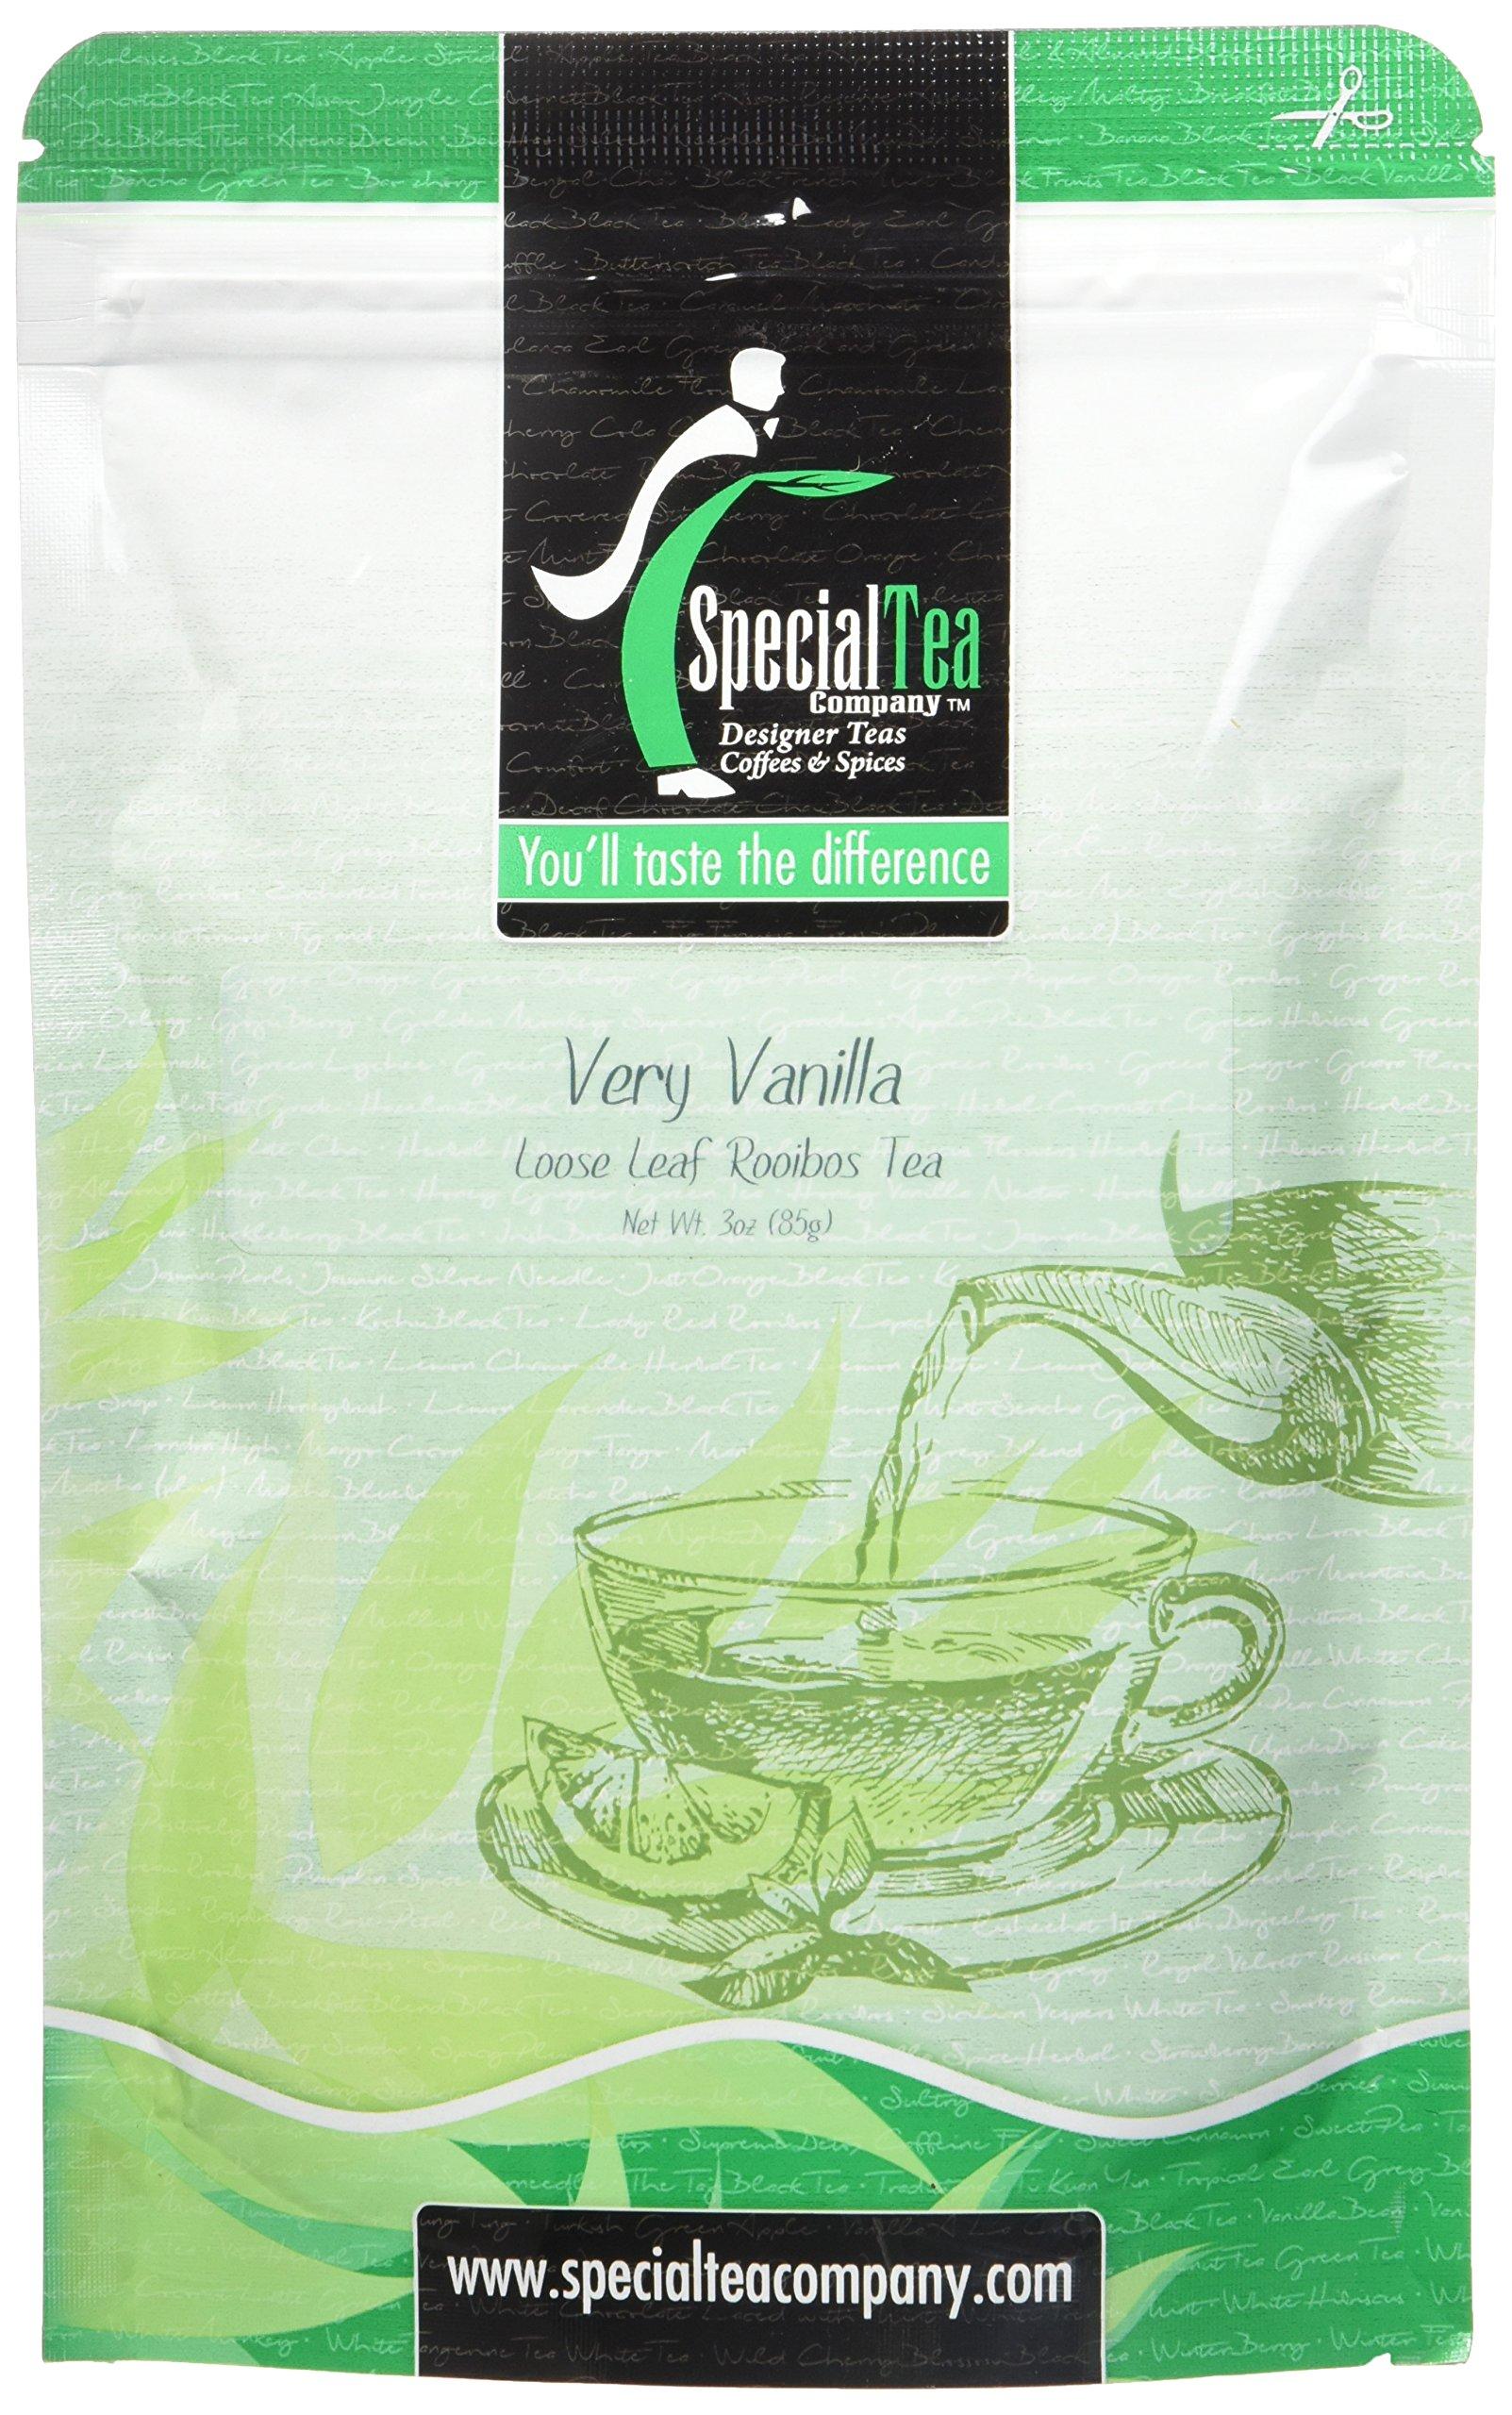 Special Tea Loose Leaf Rooibos Tea, Very Vanilla, 3 Ounce